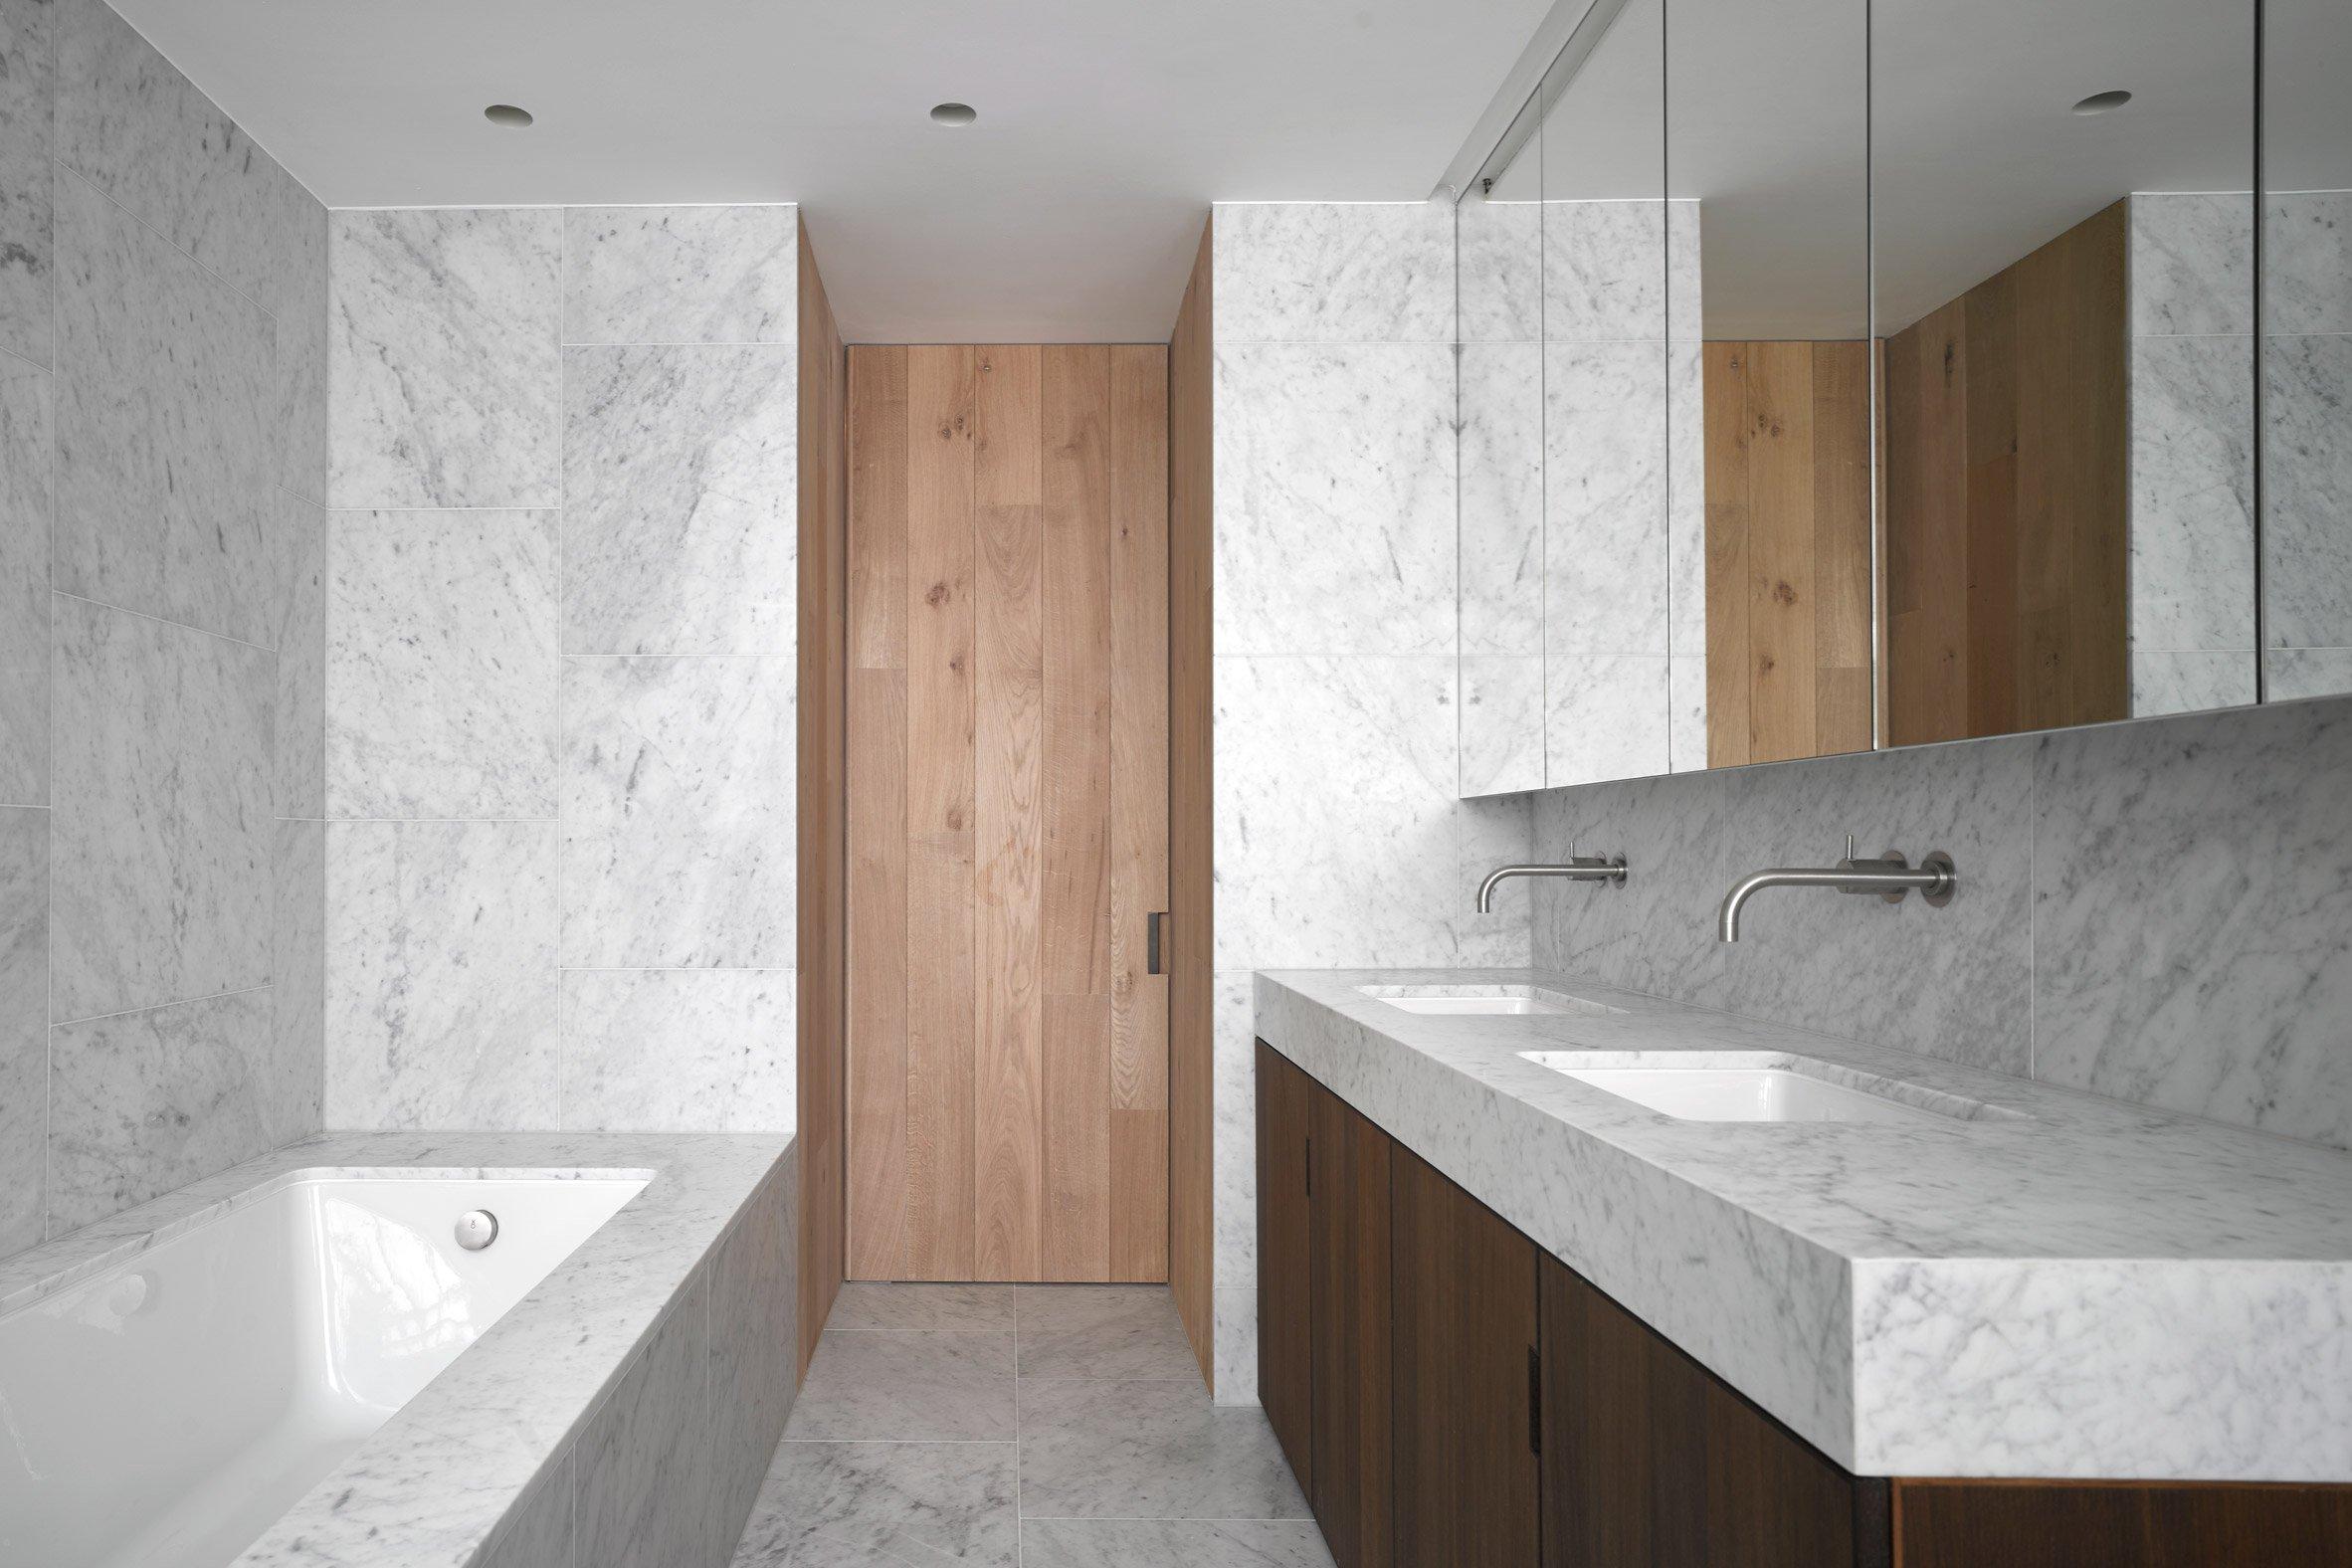 architecture-residential-london-interior-design-studia-osnovadesign-osnova-poltava_11